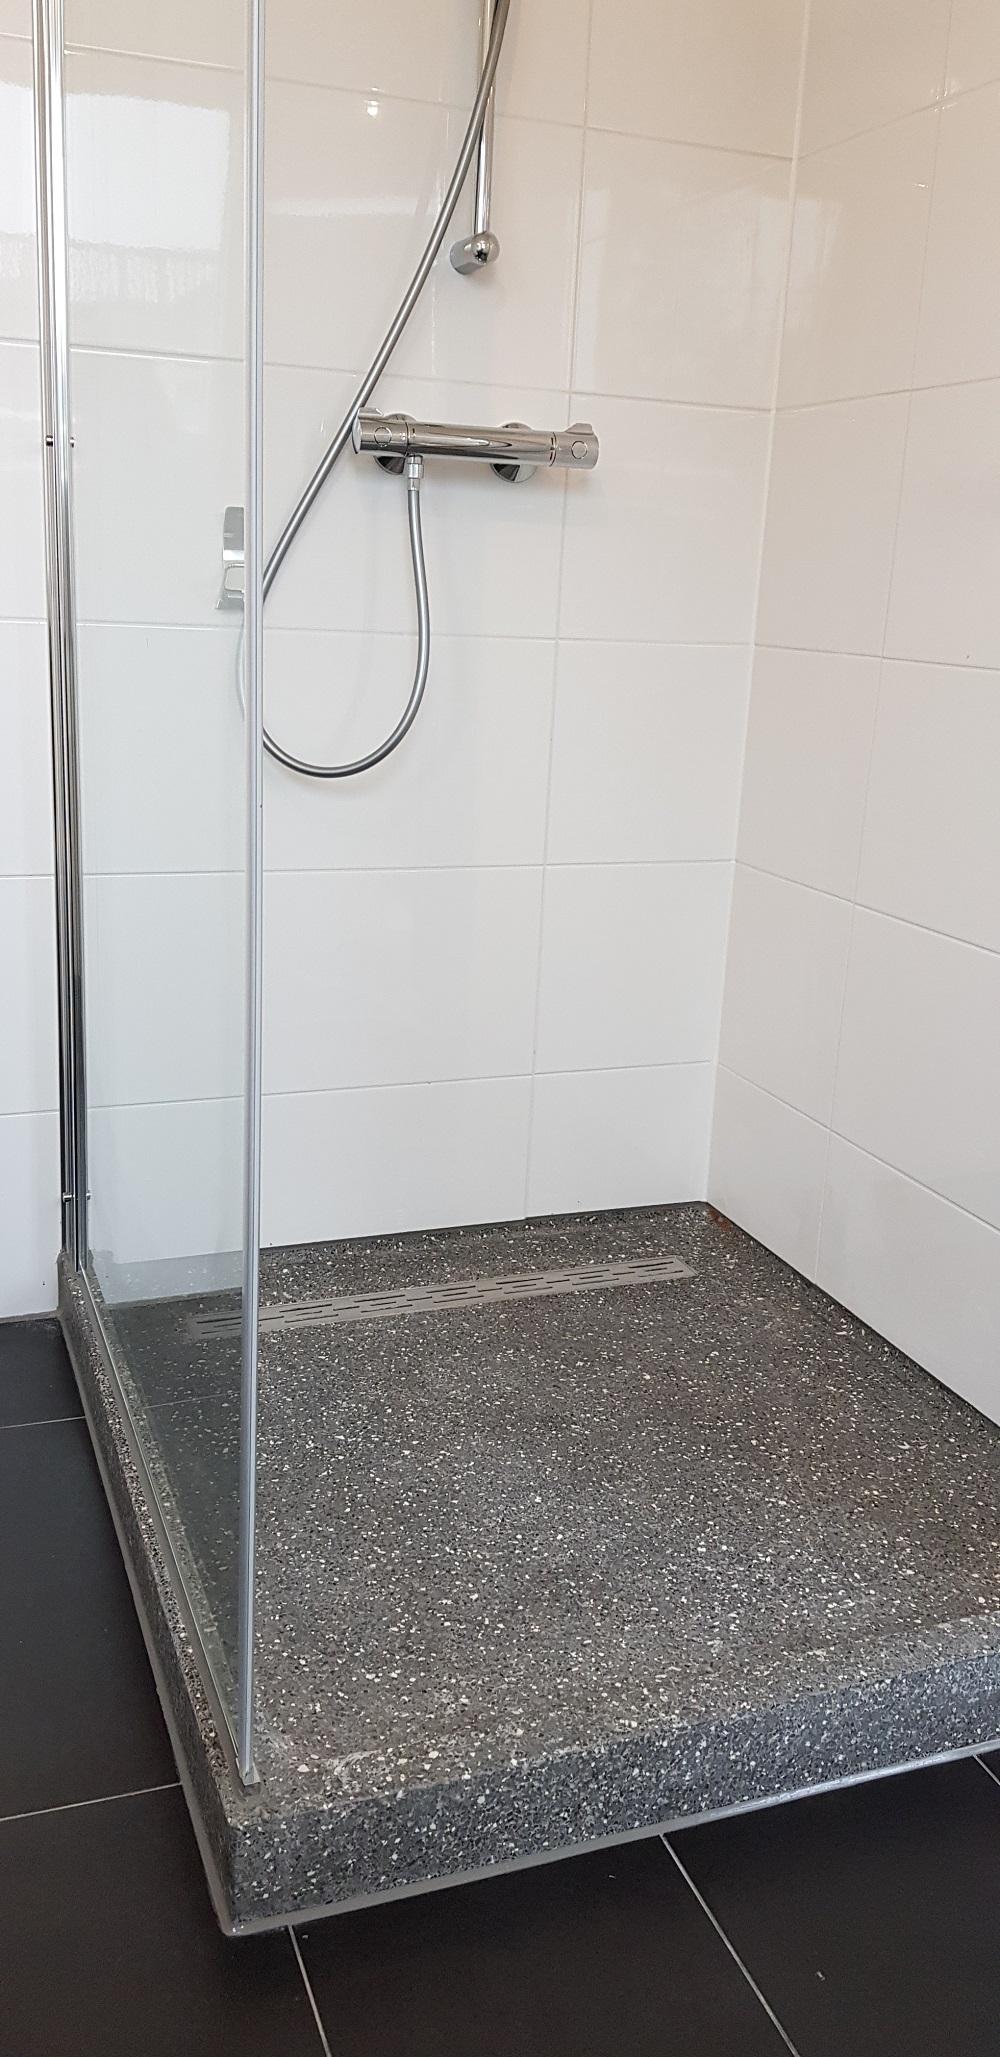 UFA Bouw_Verbouwing_Bosboom Toussaintstraat 31_1e badkamer douchekabine